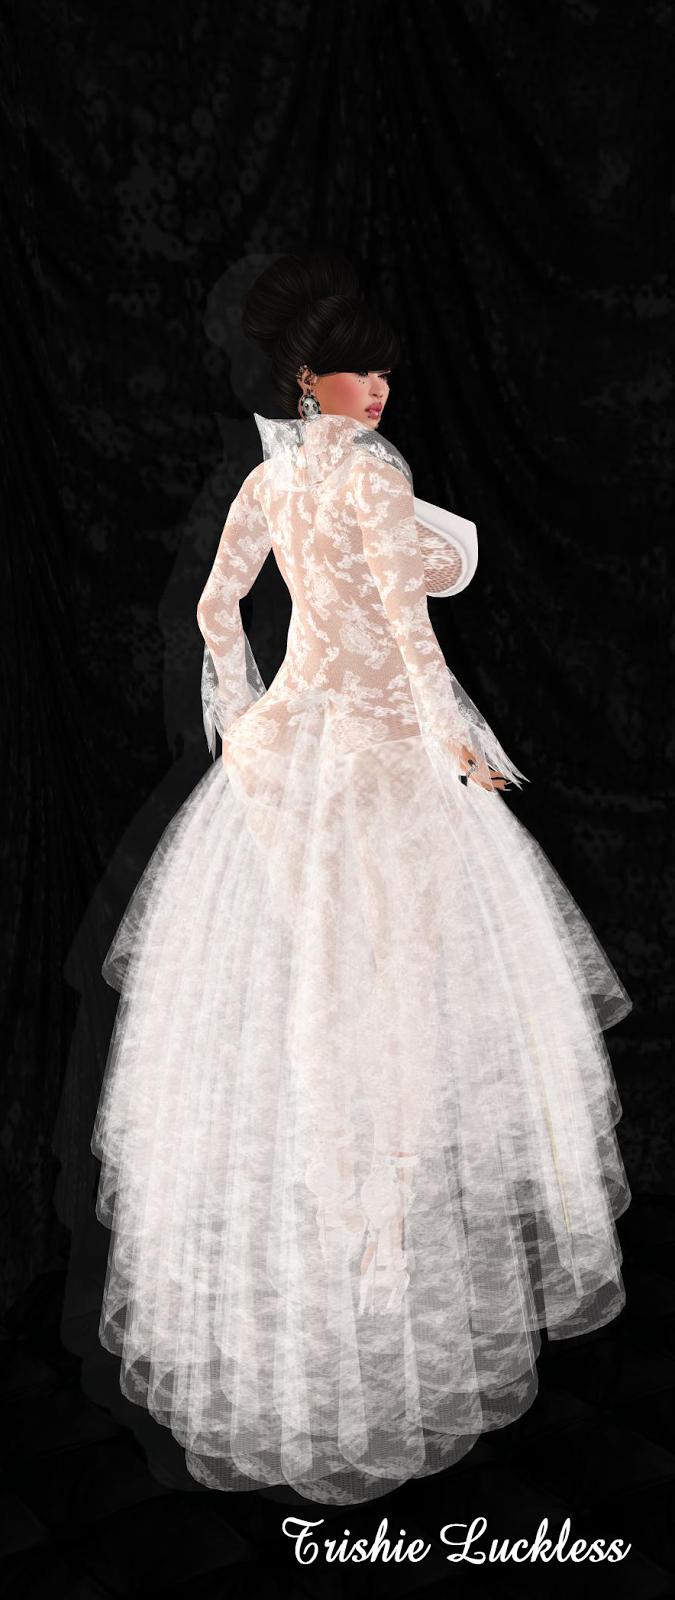 Luckie Inc New Tango Lush Gown Dress Ballroom Wedding